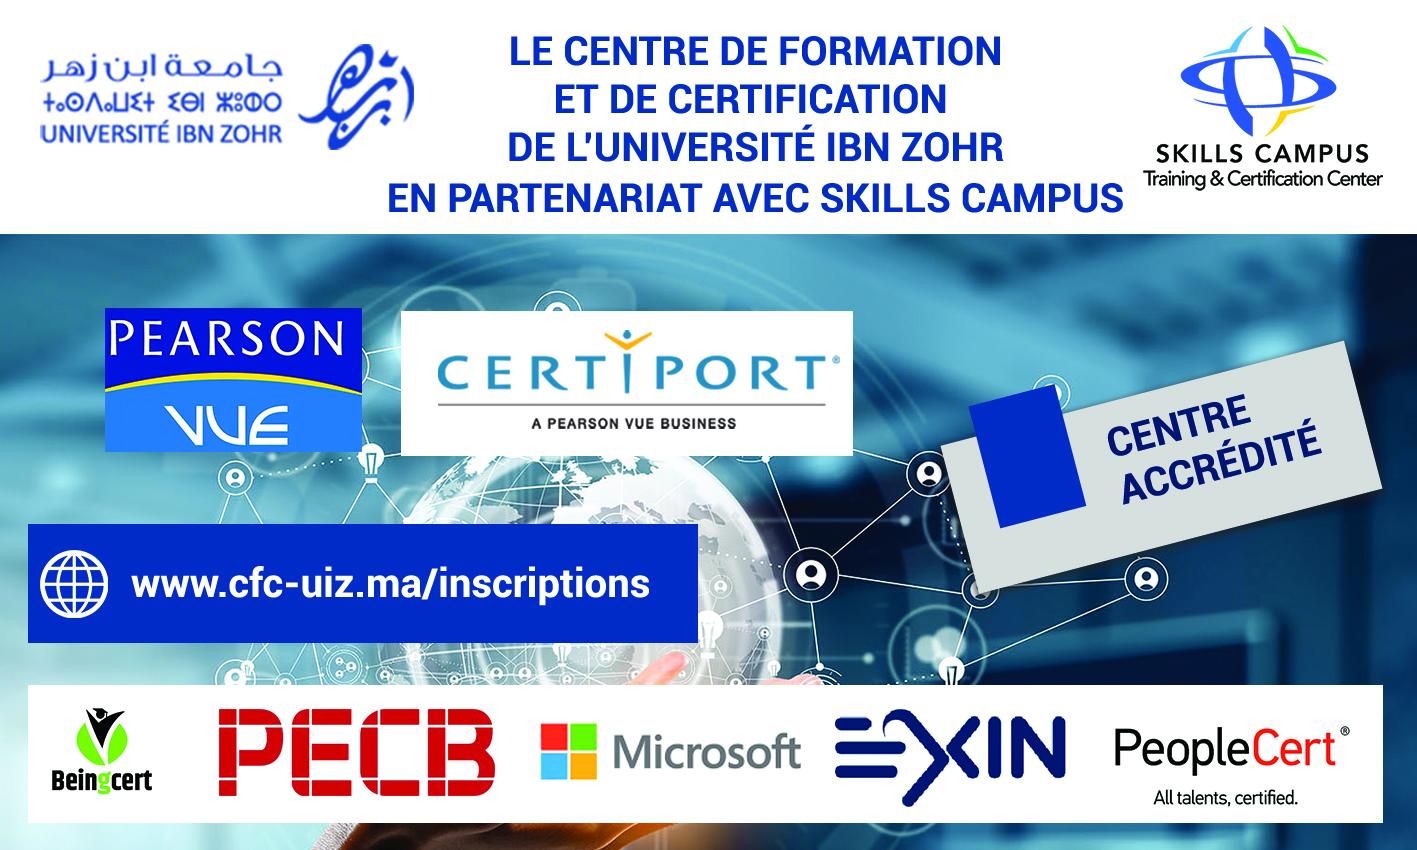 Centre De Certification De Luiz Facult De Mdecine Et De